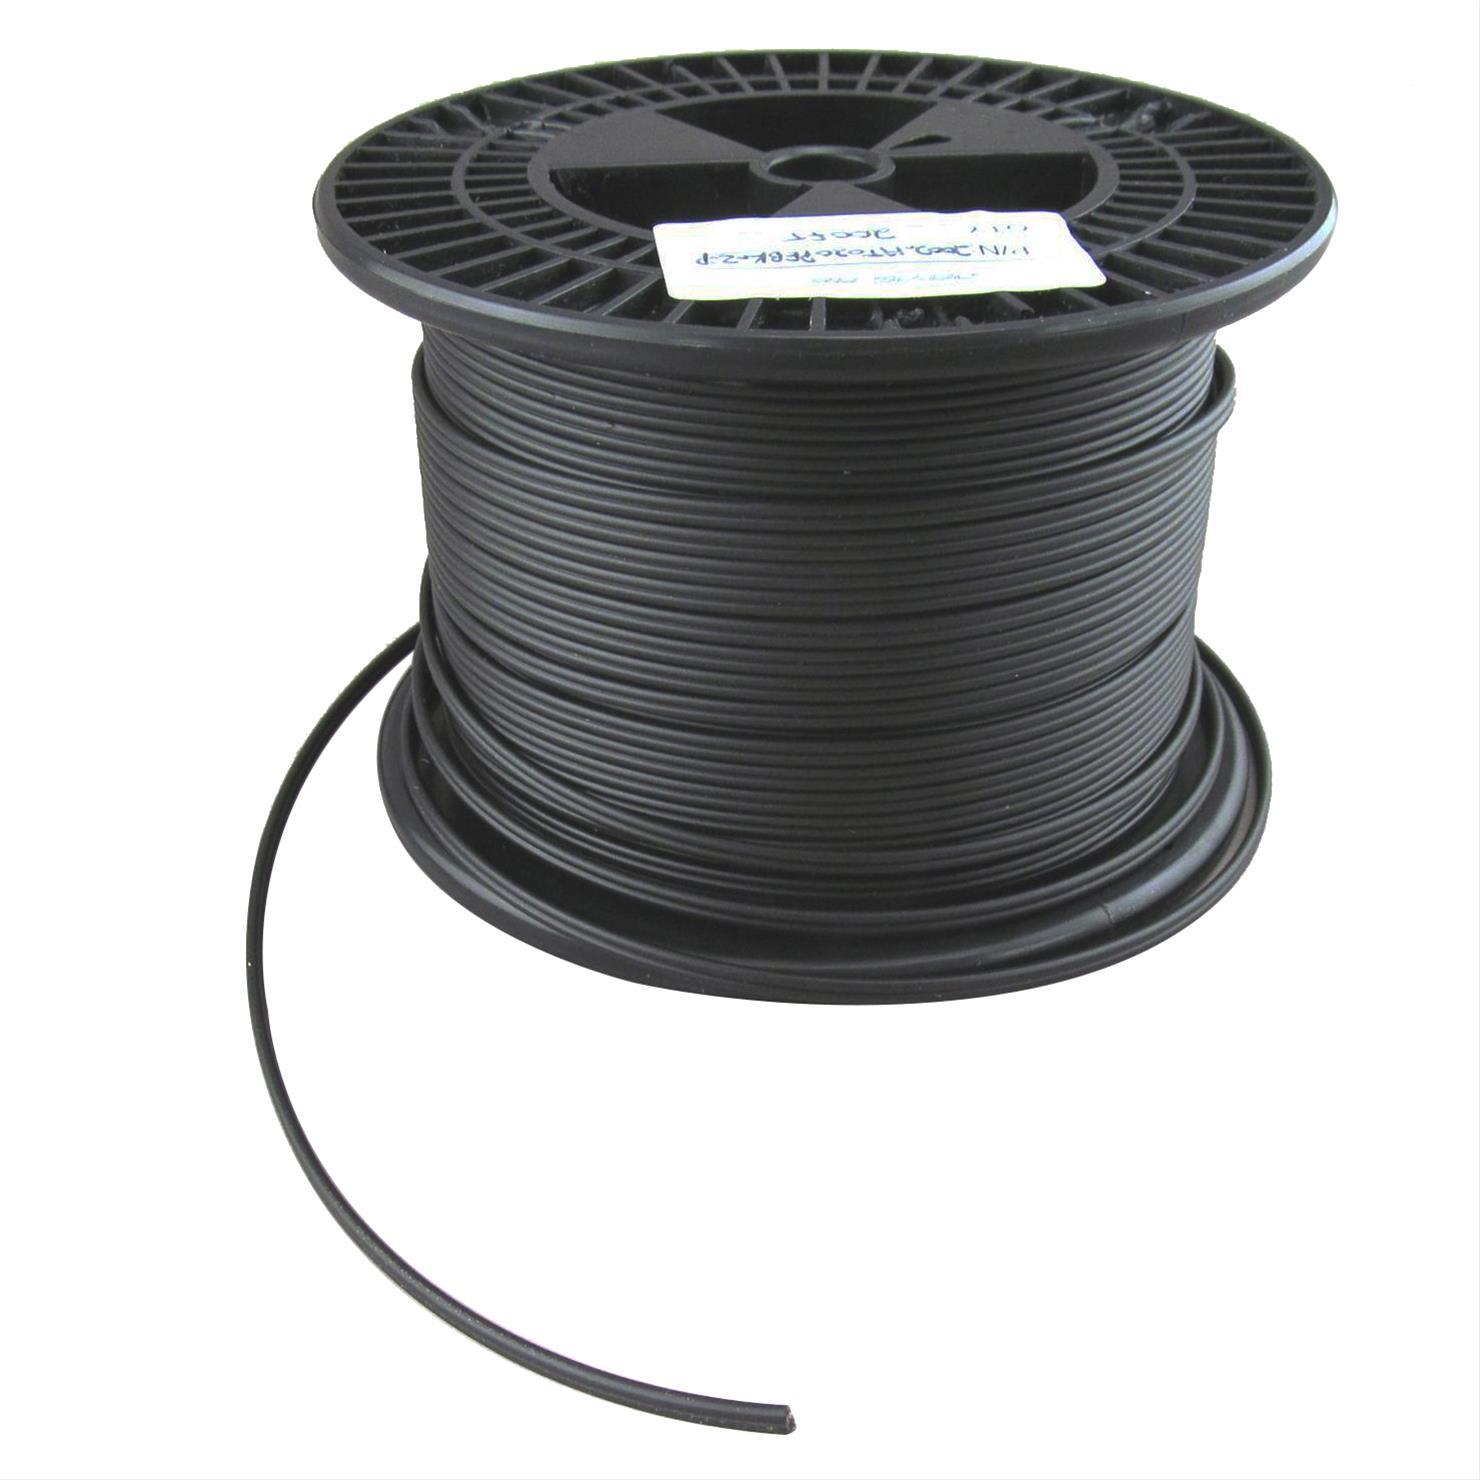 KD9SV Products RBOG Reversible Beverage-On-Ground Antenna Wire SV-RBOGANTW